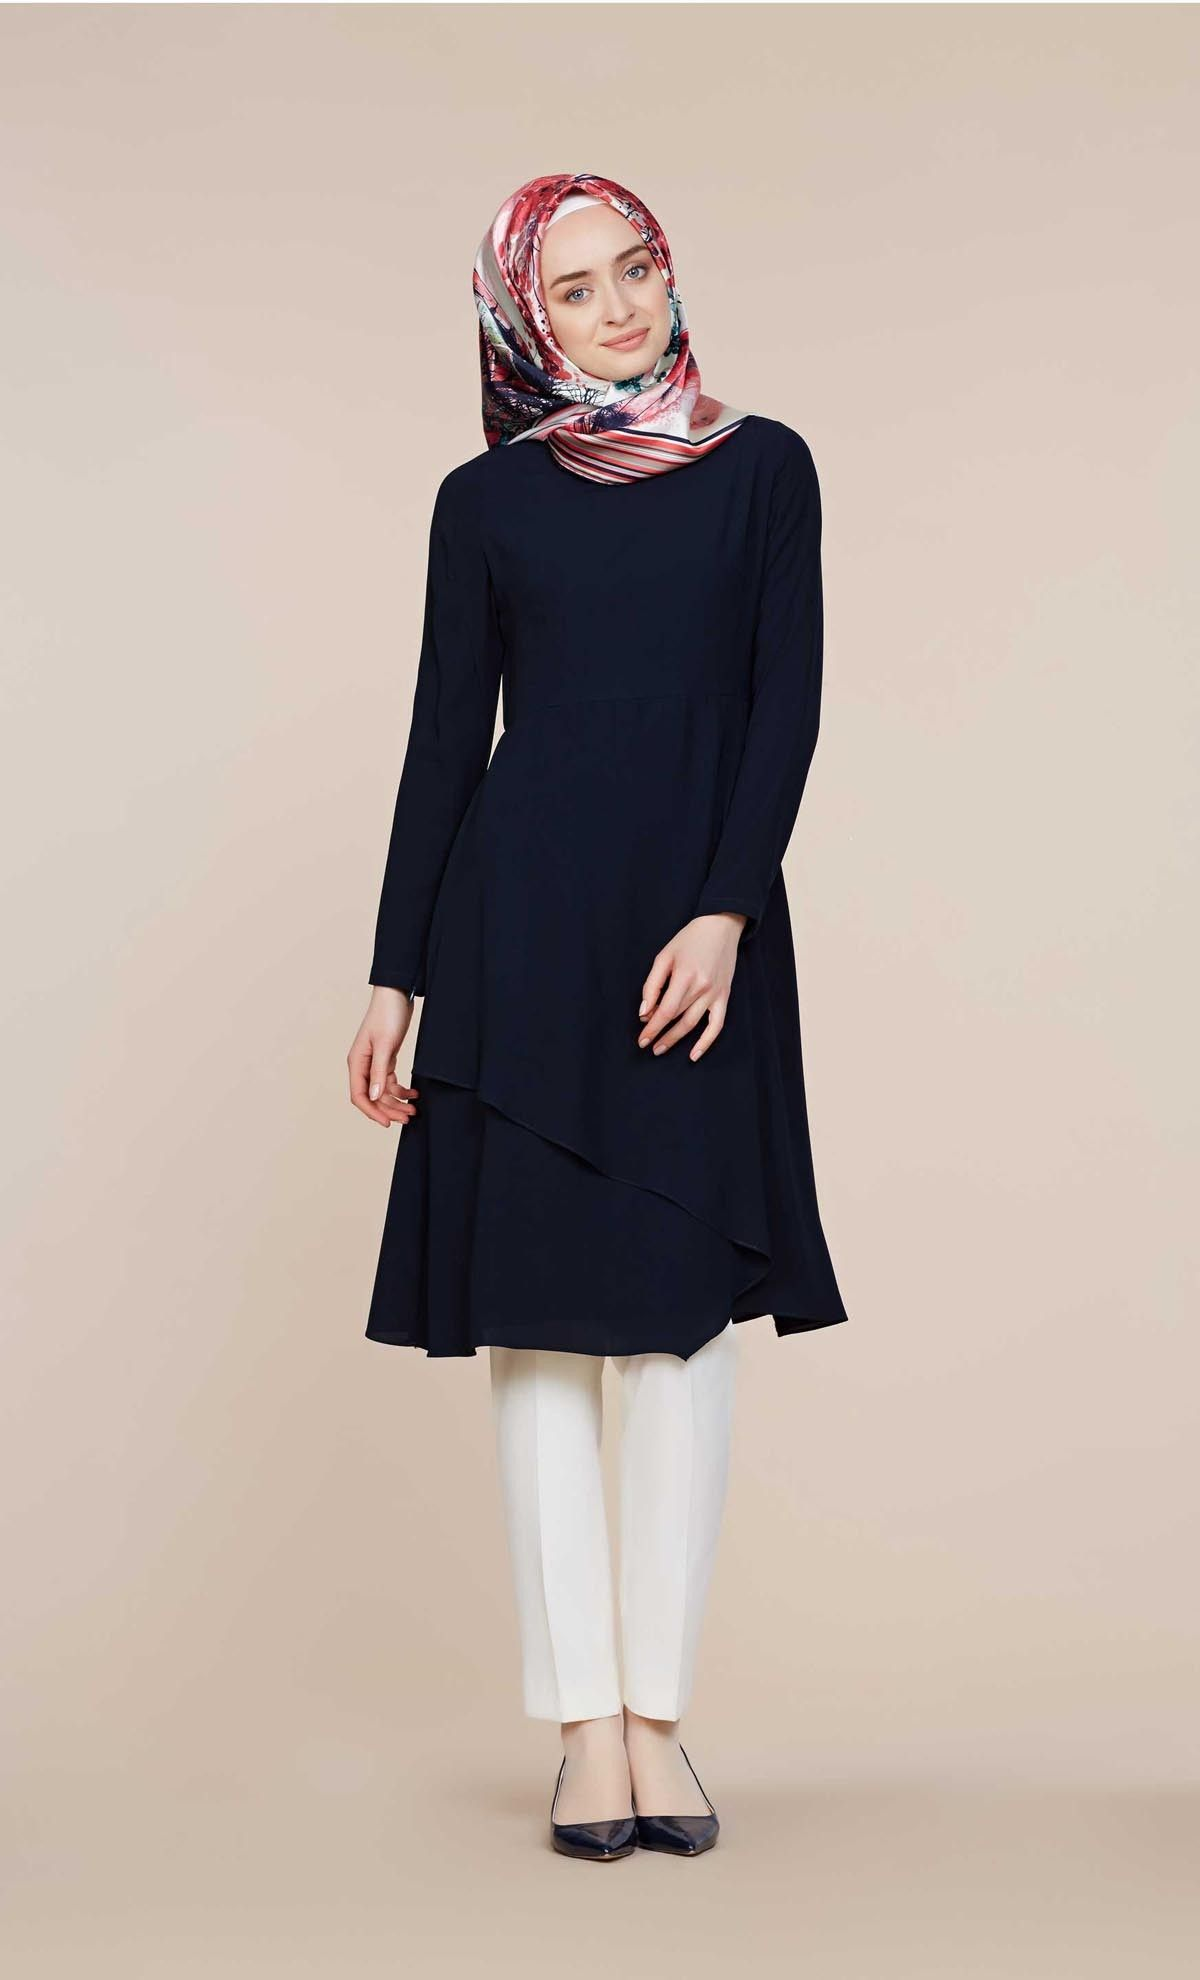 Tugba Store Tesettur Giyim Tesettur Elbise Pardesu Manto Online Alisveris Desain Blus Gaun Dan Desain